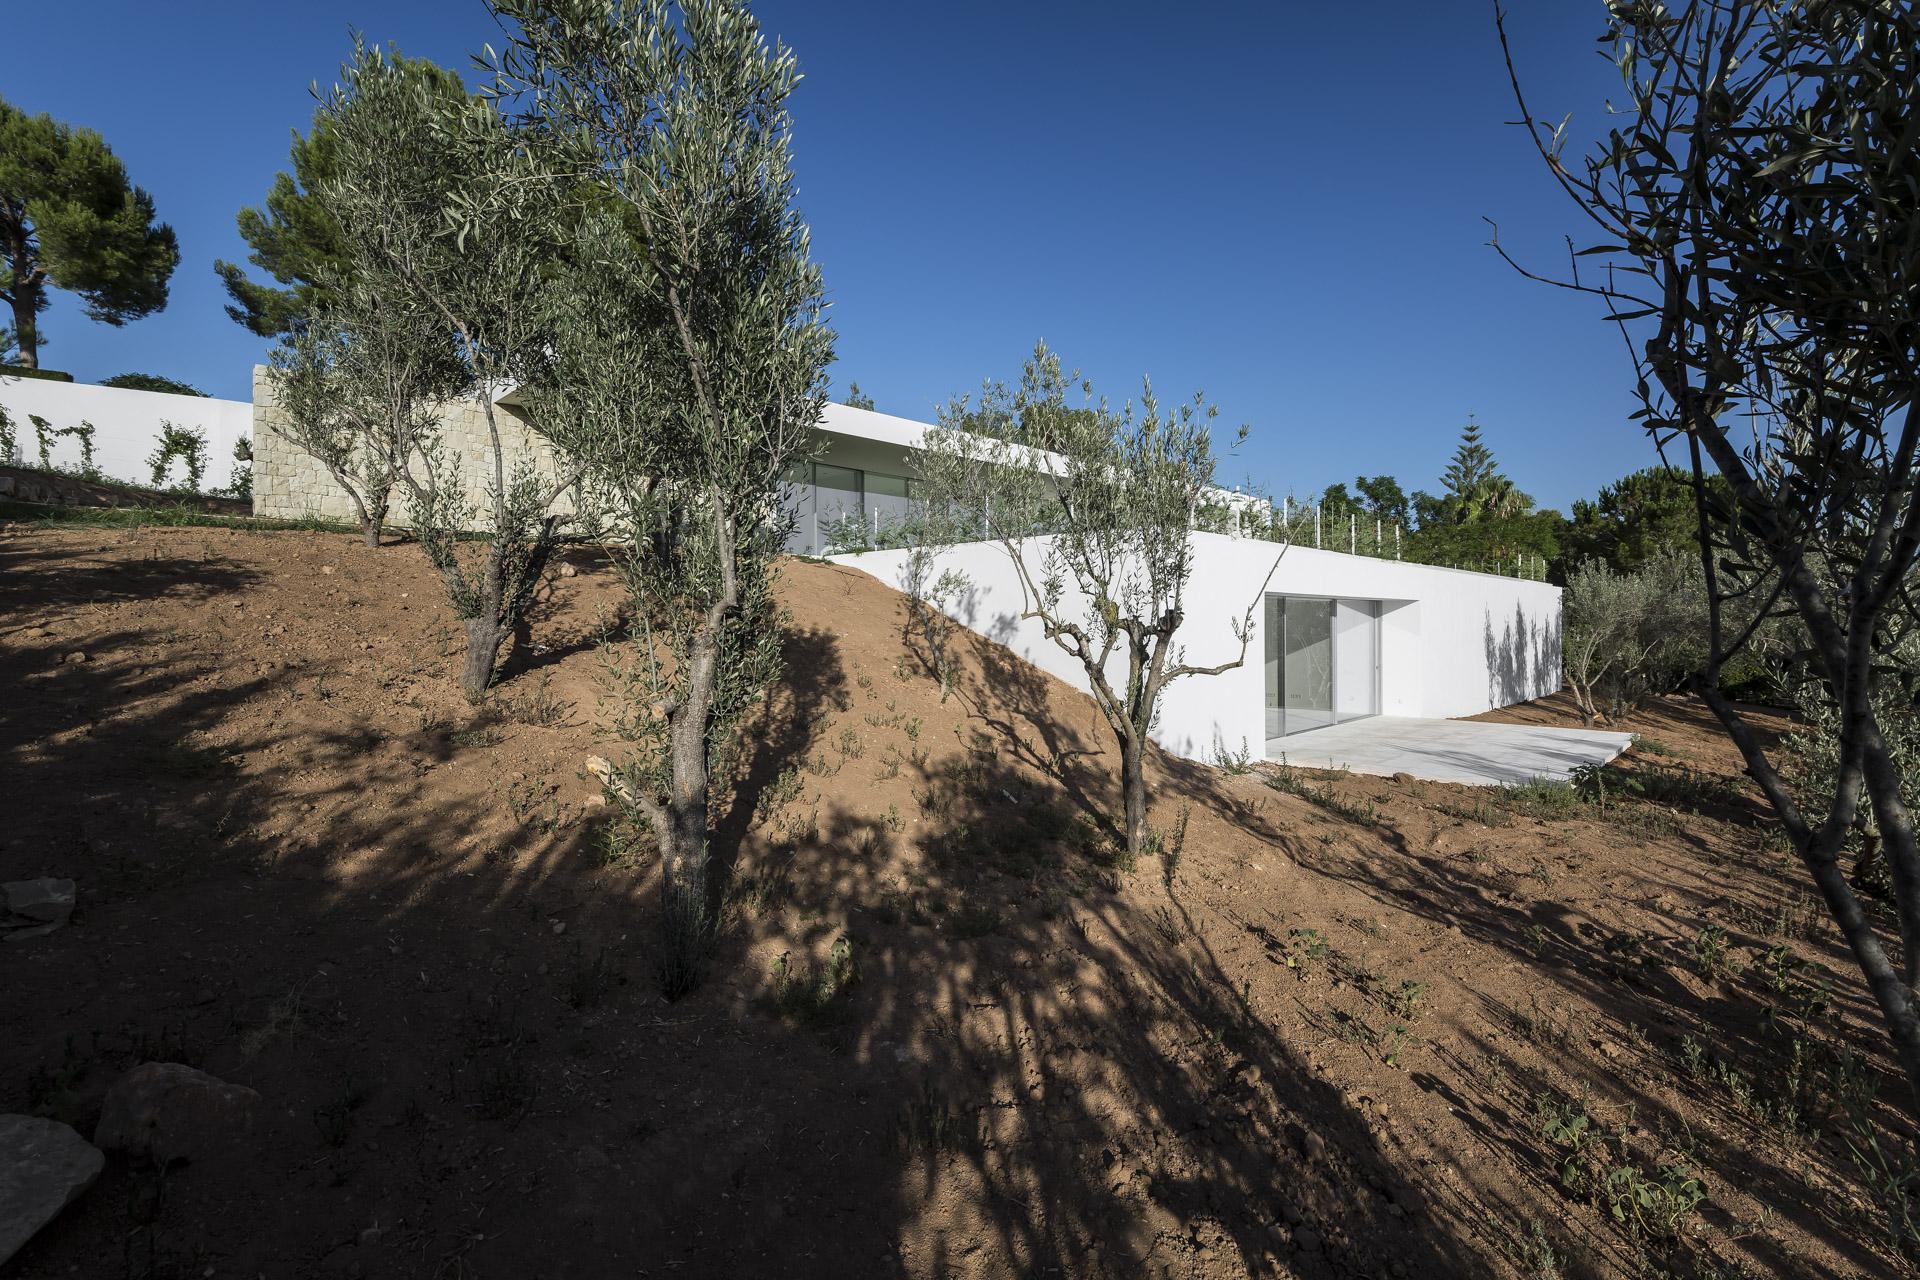 fotografia-arquitectura-valencia-german-cabo-gallardo-llopis-villamarchante-vivienda-31